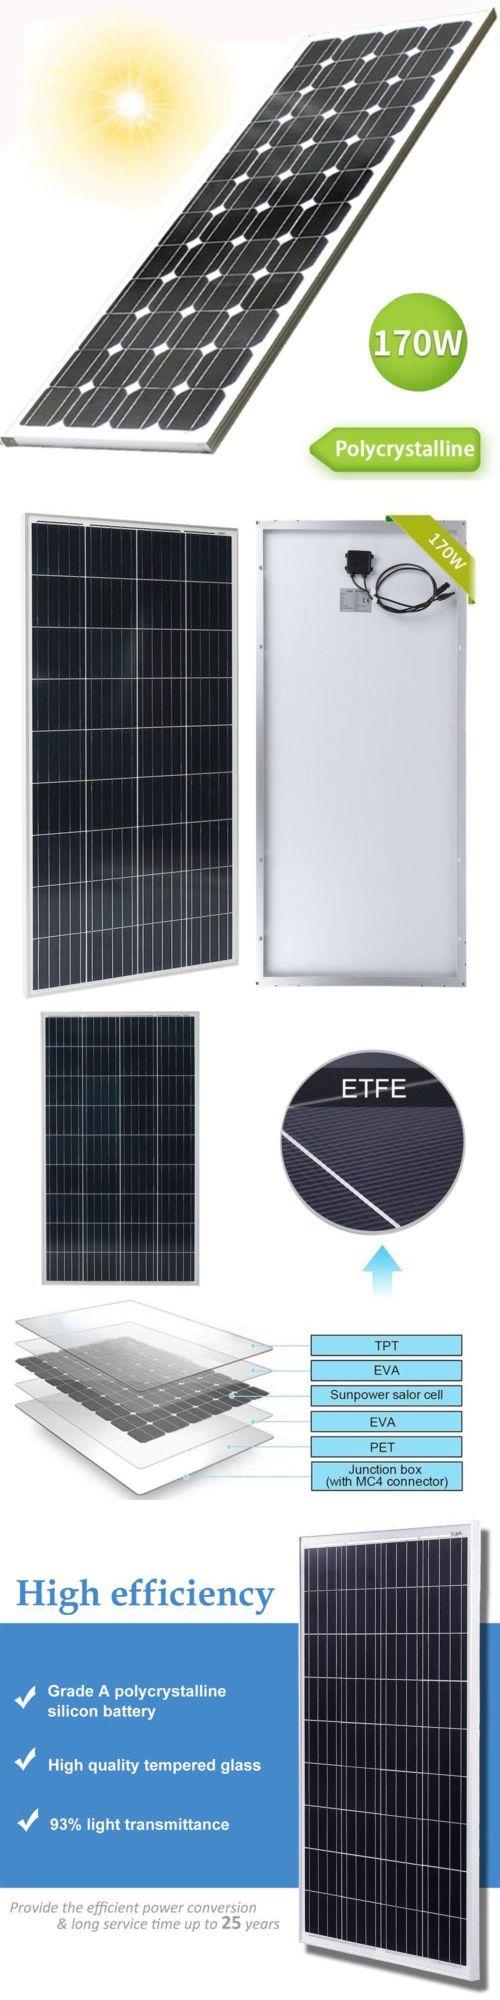 Alternative And Solar Energy 41979 12v 170w Polycrystalline Solar Panel Off Grid Battery Charge Rv Boat Ou Solar Panels Solar Panel Battery Off Grid Batteries